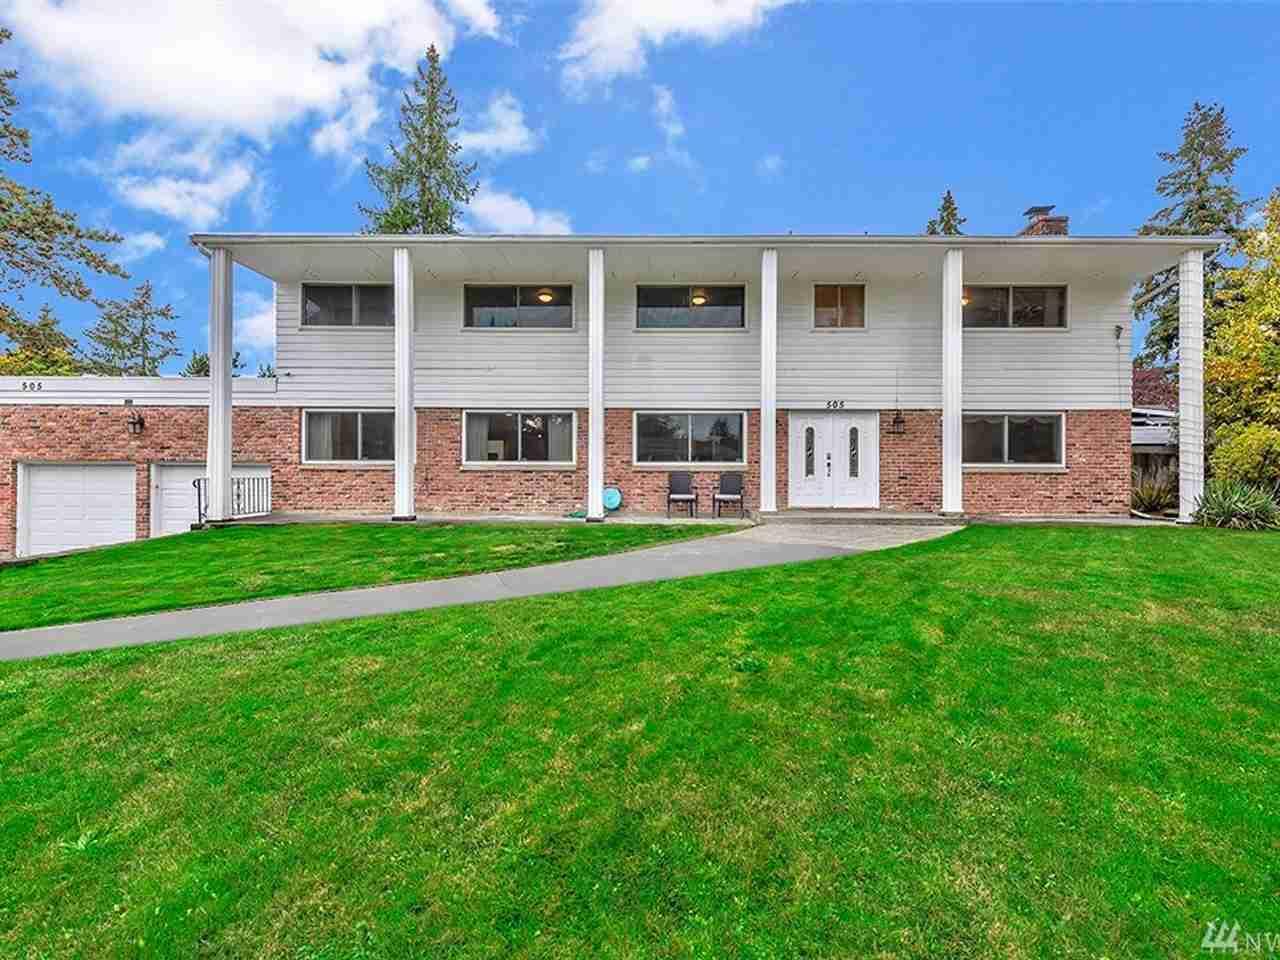 505 145th Place NE Bellevue, WA, 98007